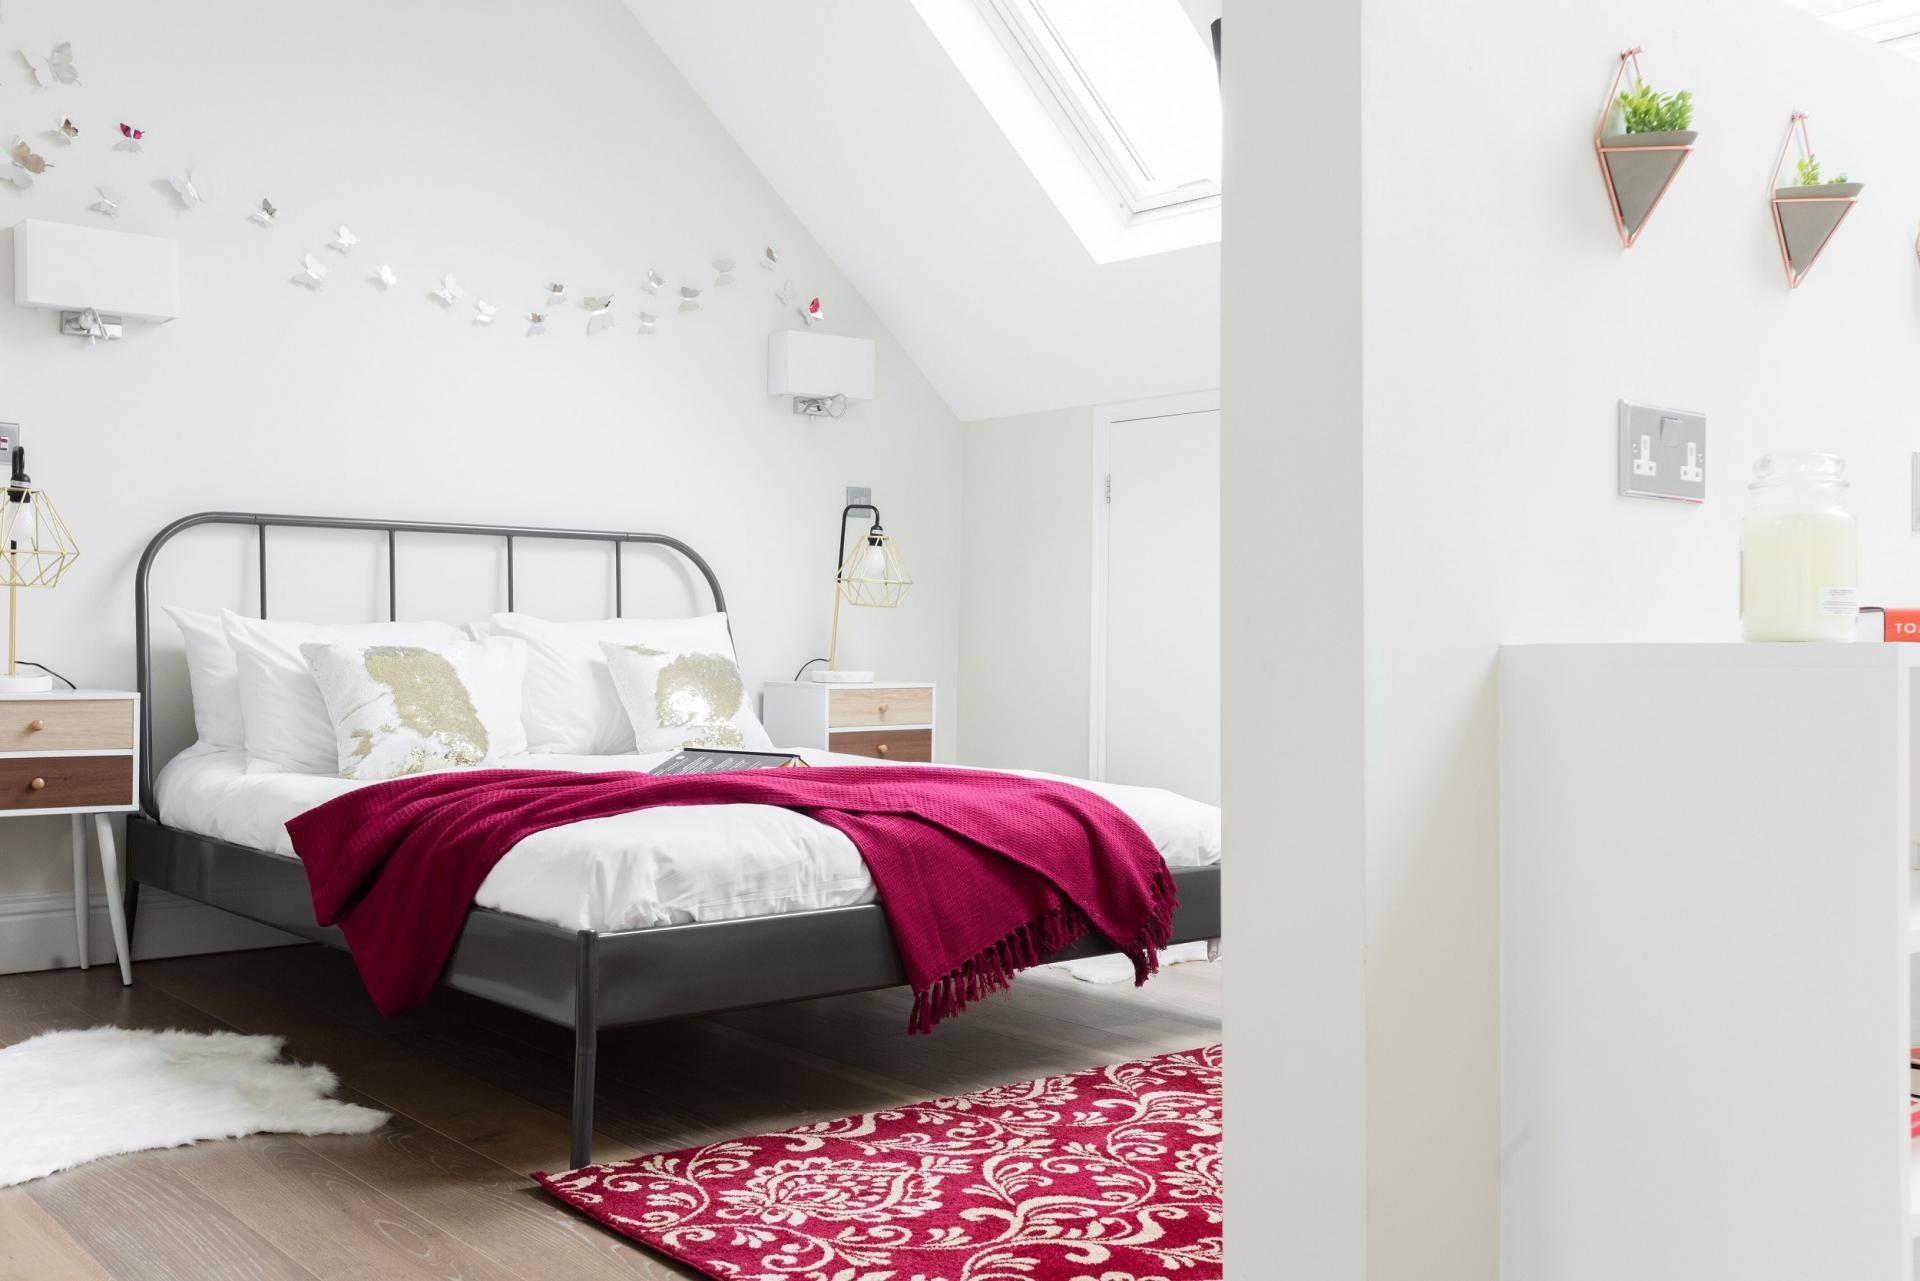 Pink decor at The Soho Studio Apartment, Paddington, London - Citybase Apartments